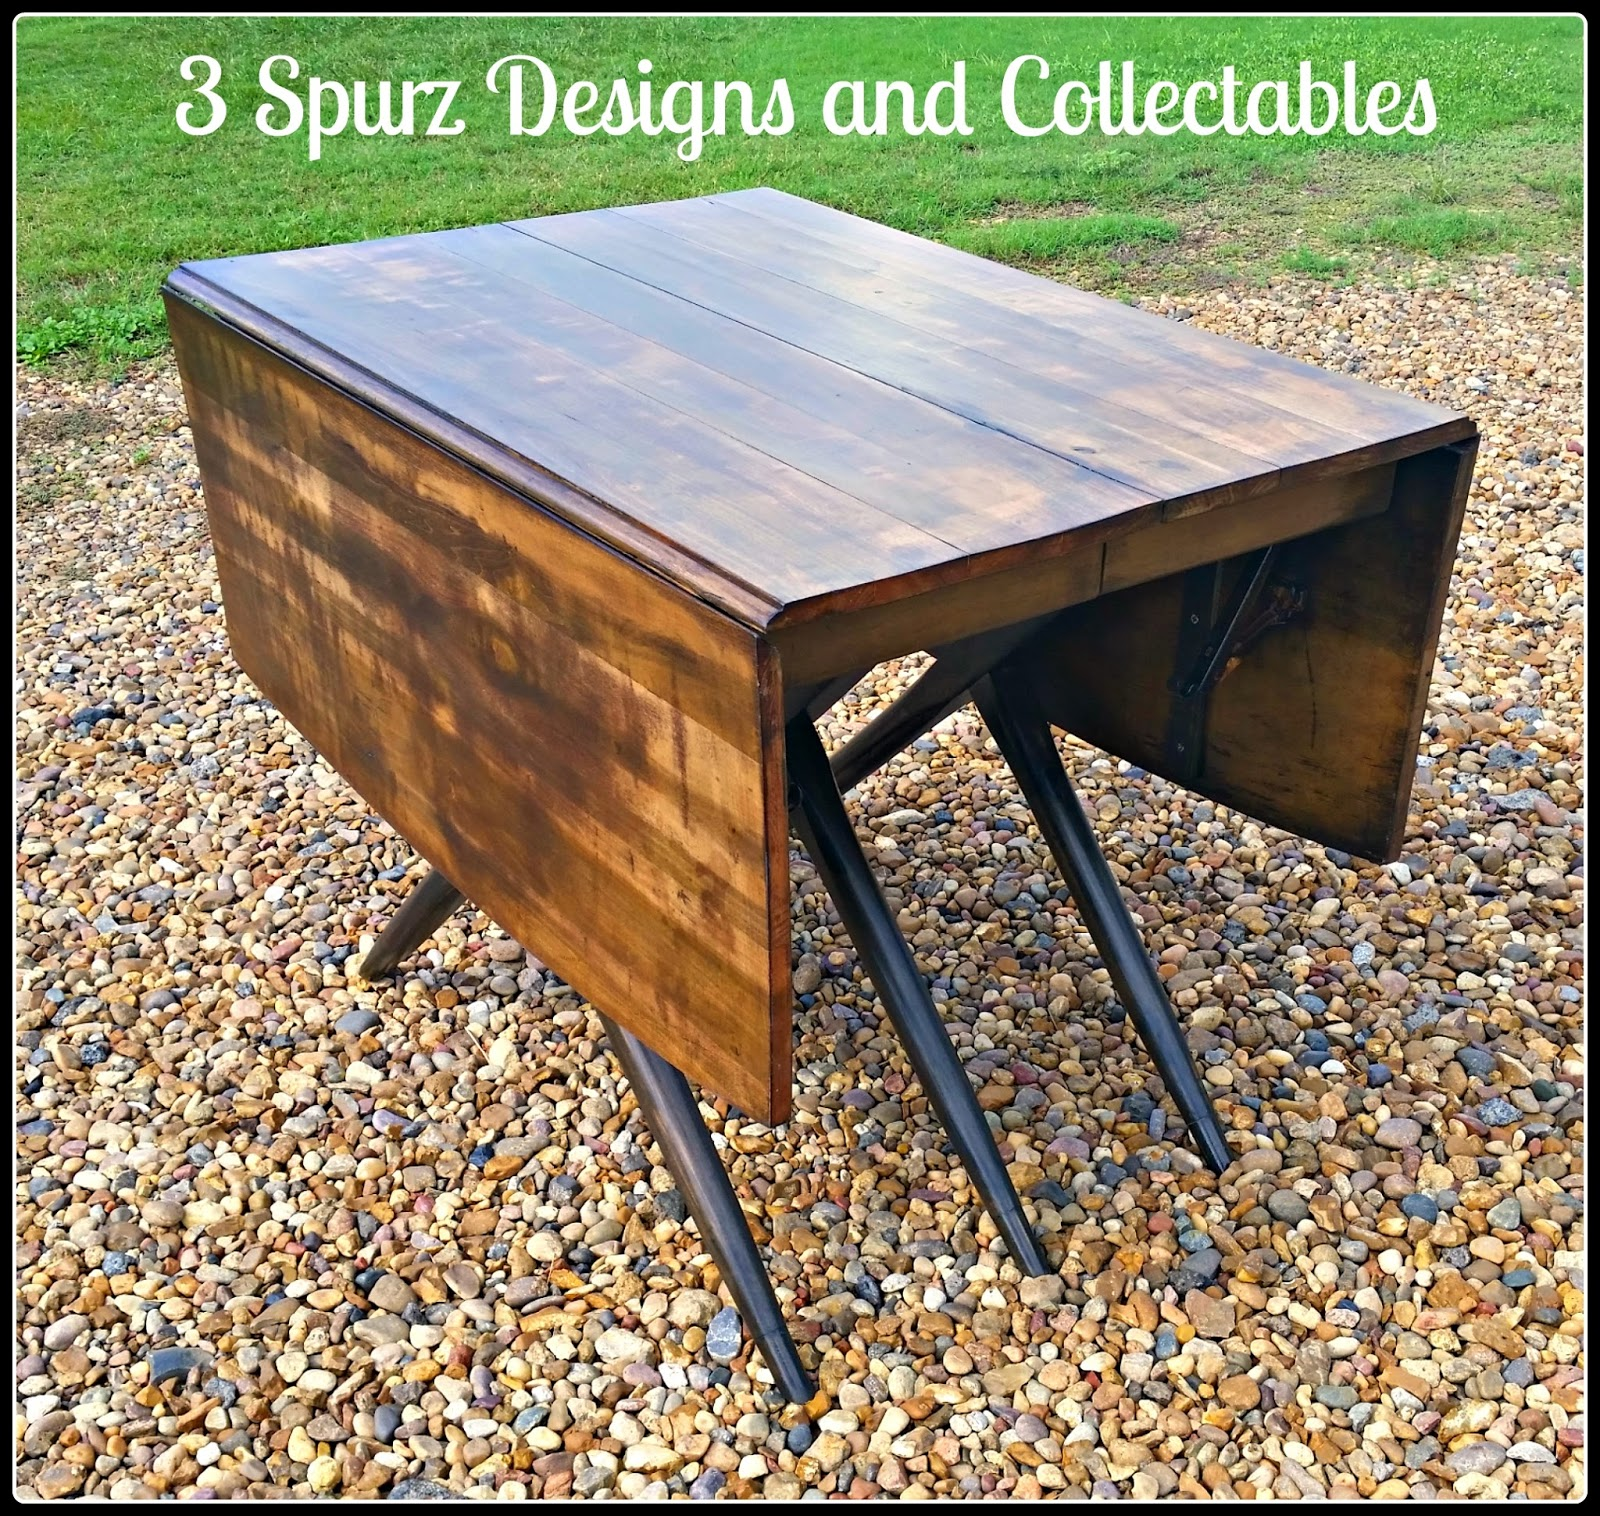 3 Spurz DandC Repurposed Refurbished Creations Table Time